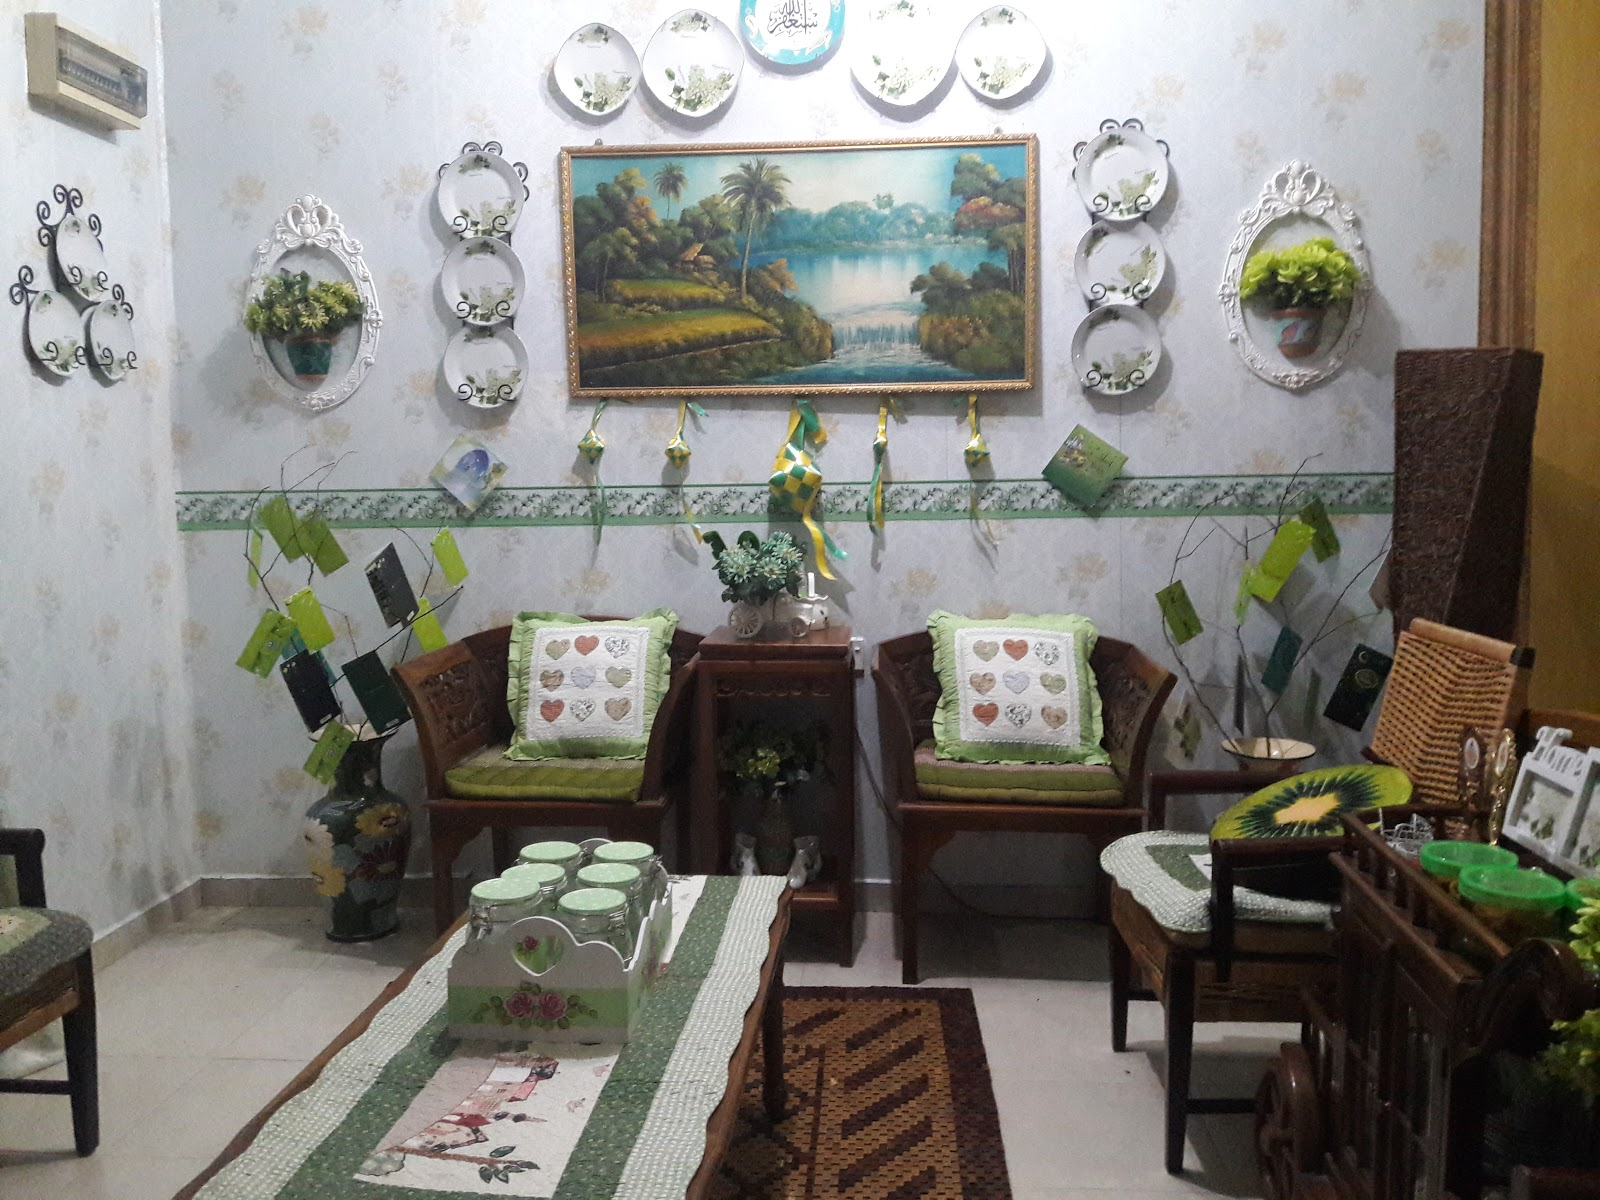 Banyak Ruang Yang Belum Mas Buat Mana Patut Dahulu Rumah Masih Ditutup Untuk Terjah Raya Bila Dah Ok Semuanya In Sha